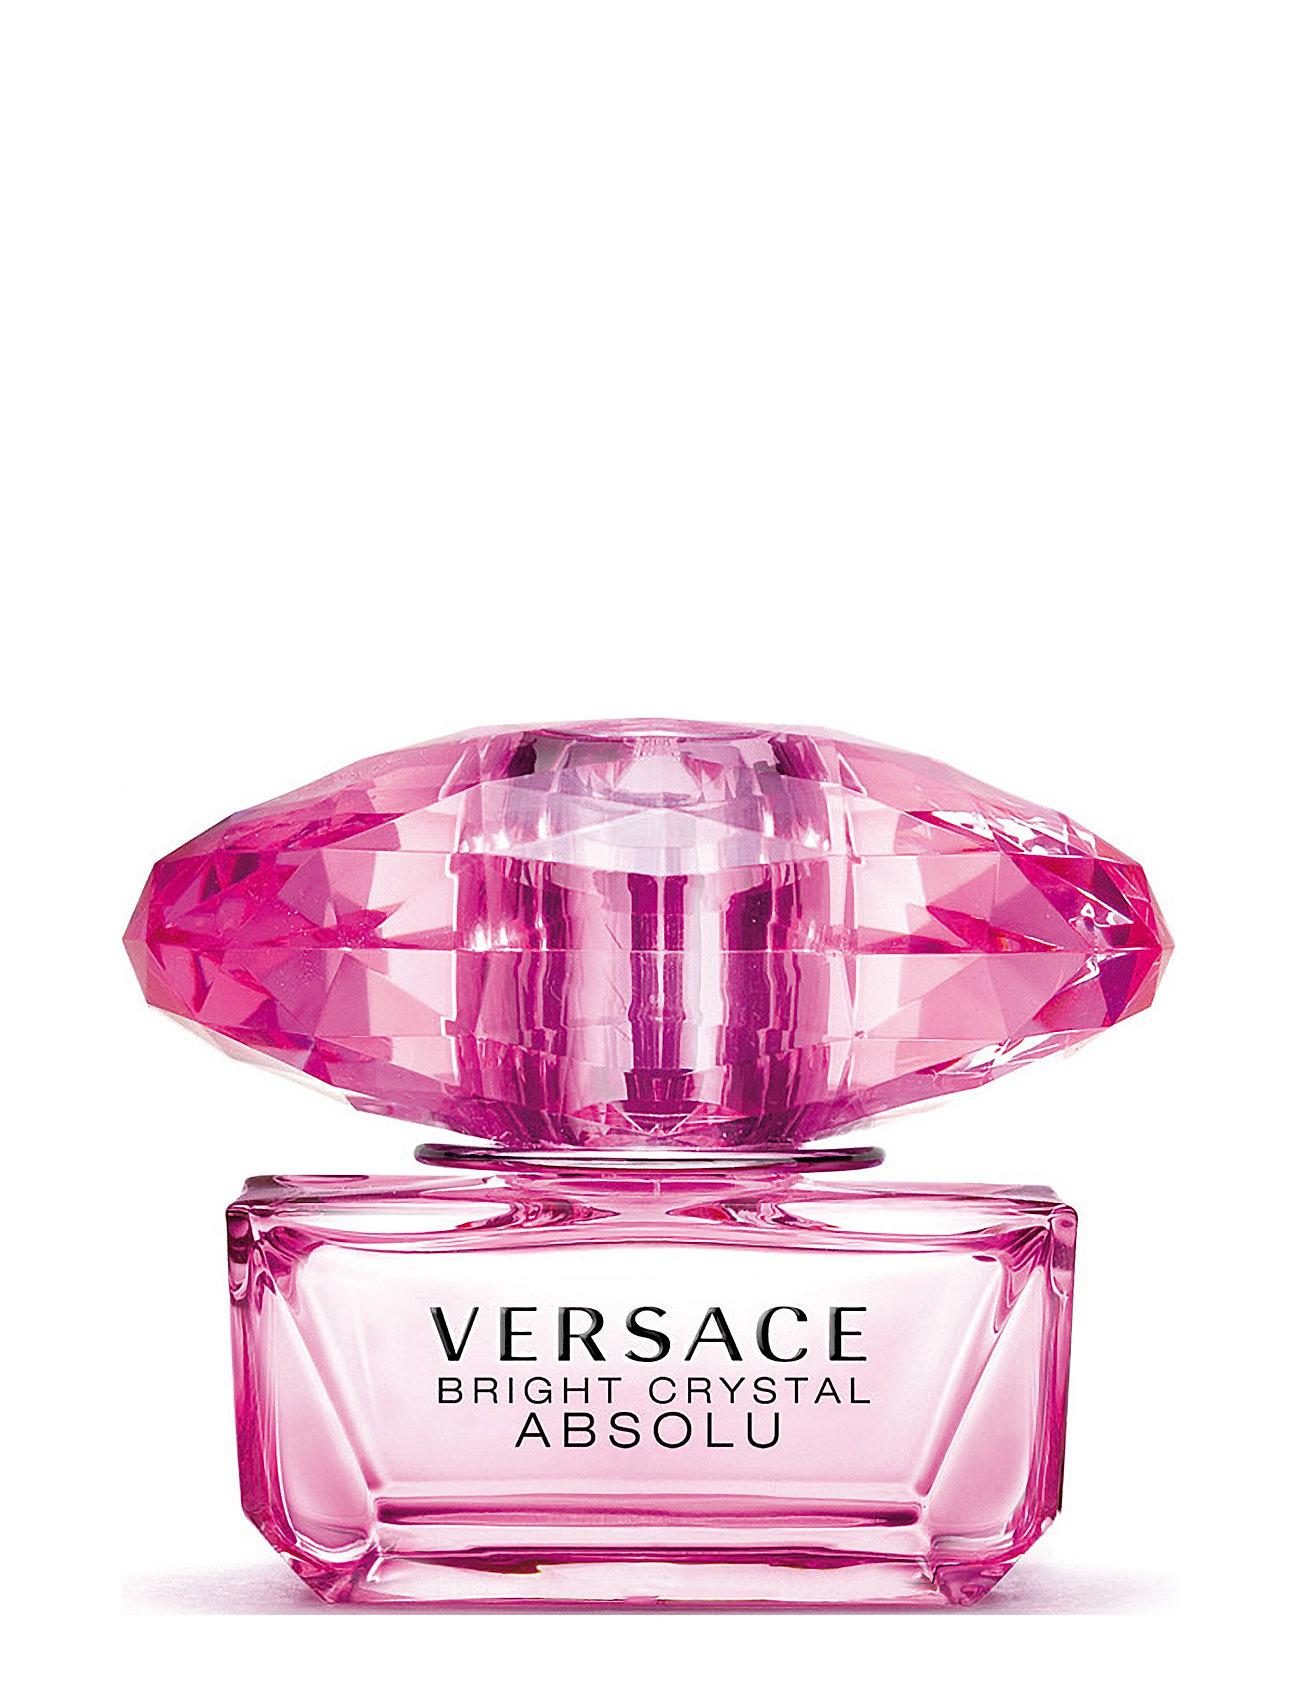 Crystal Absolu Eau De Parfu Versace Fragrance  til Damer i